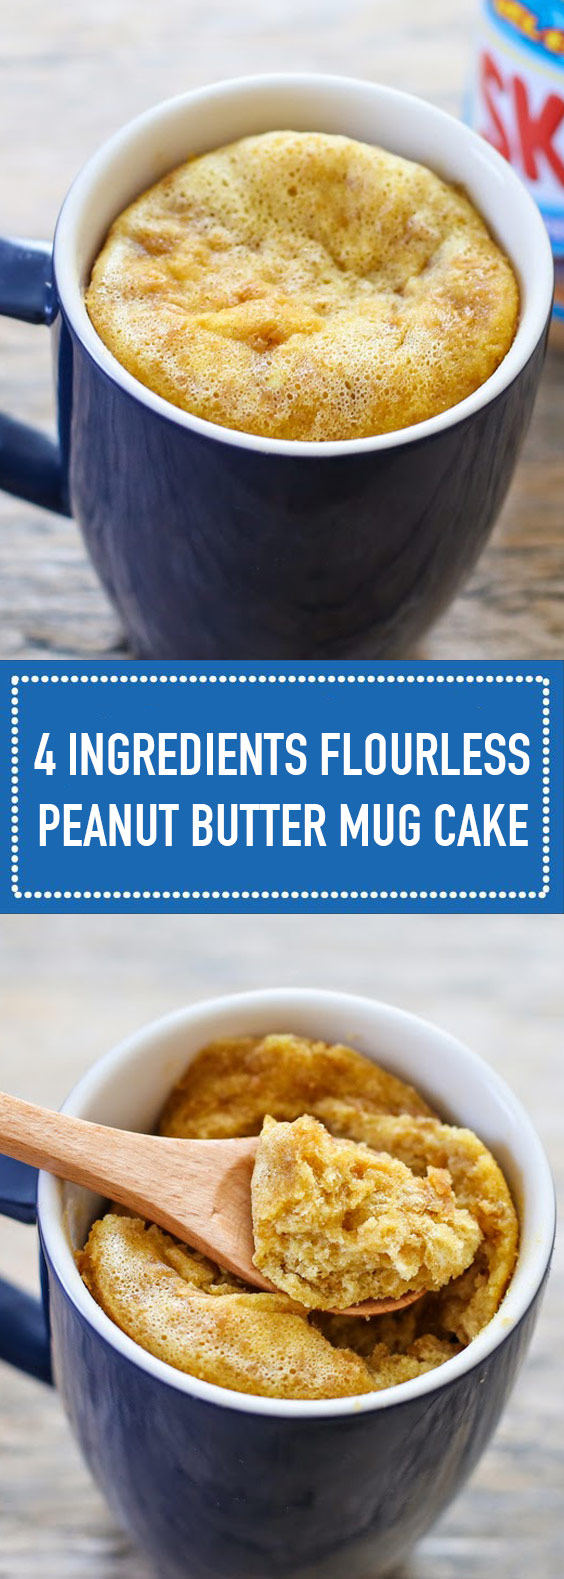 Flourless Peanut Butter Mug Cake